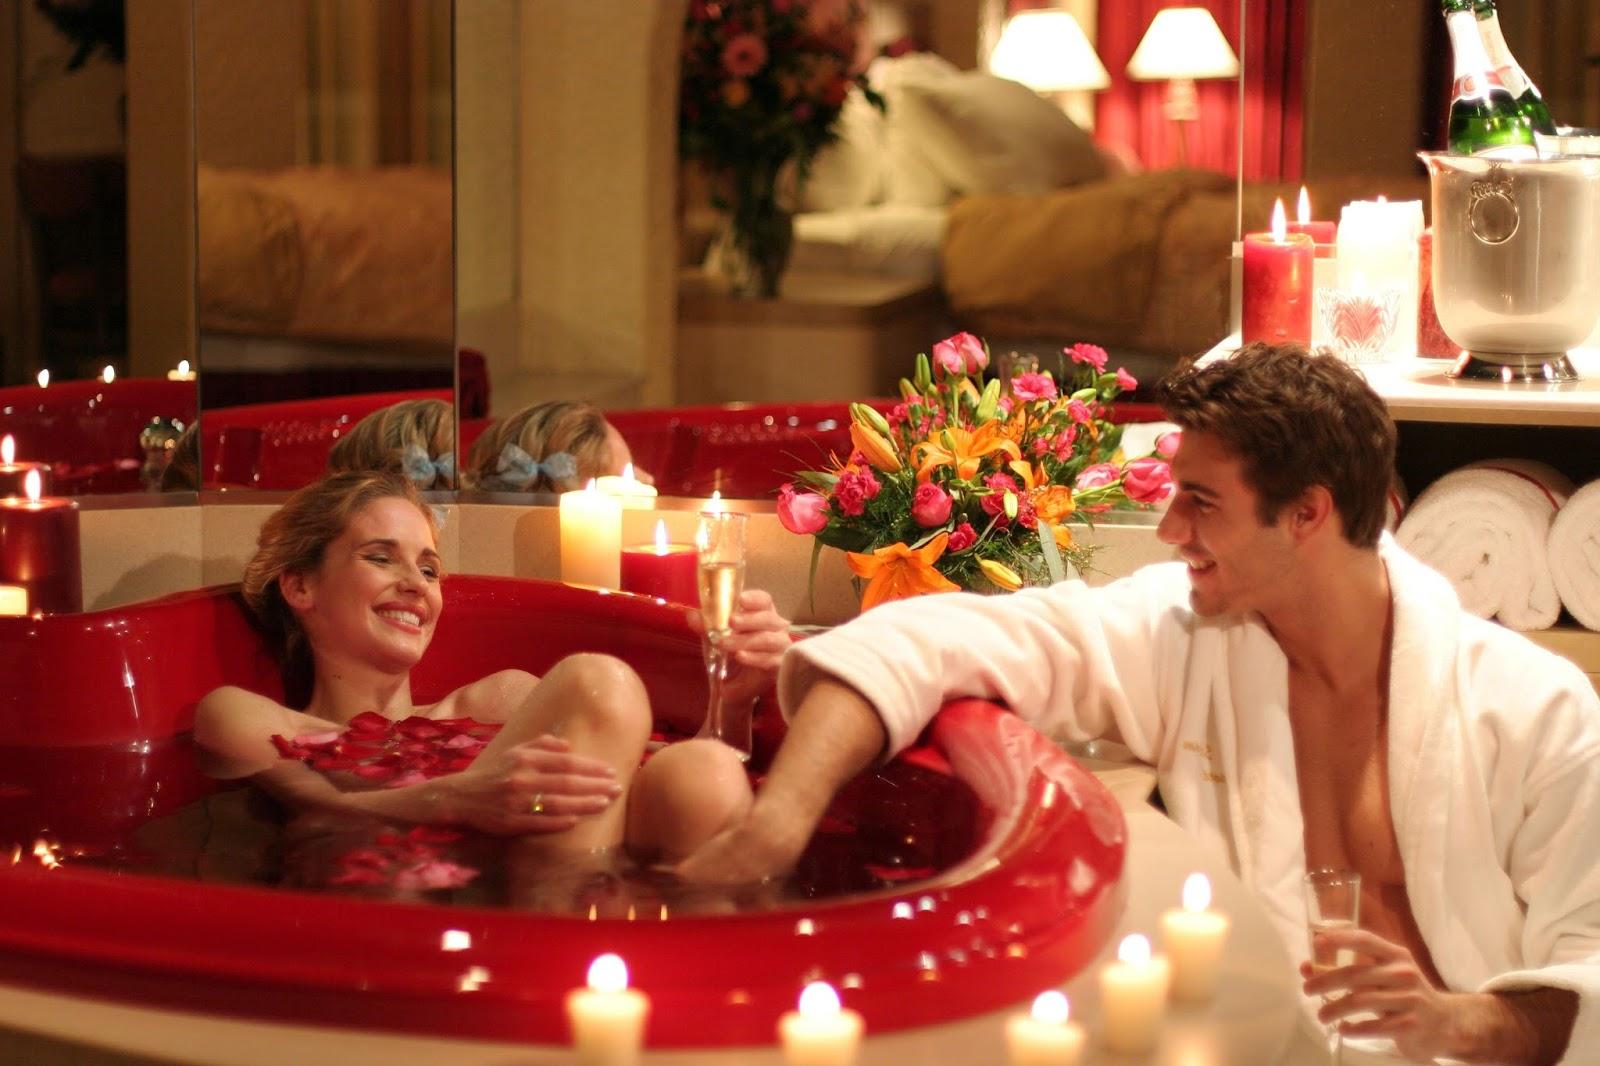 Фото девушек в ванне с лепестками роз 24 фотография